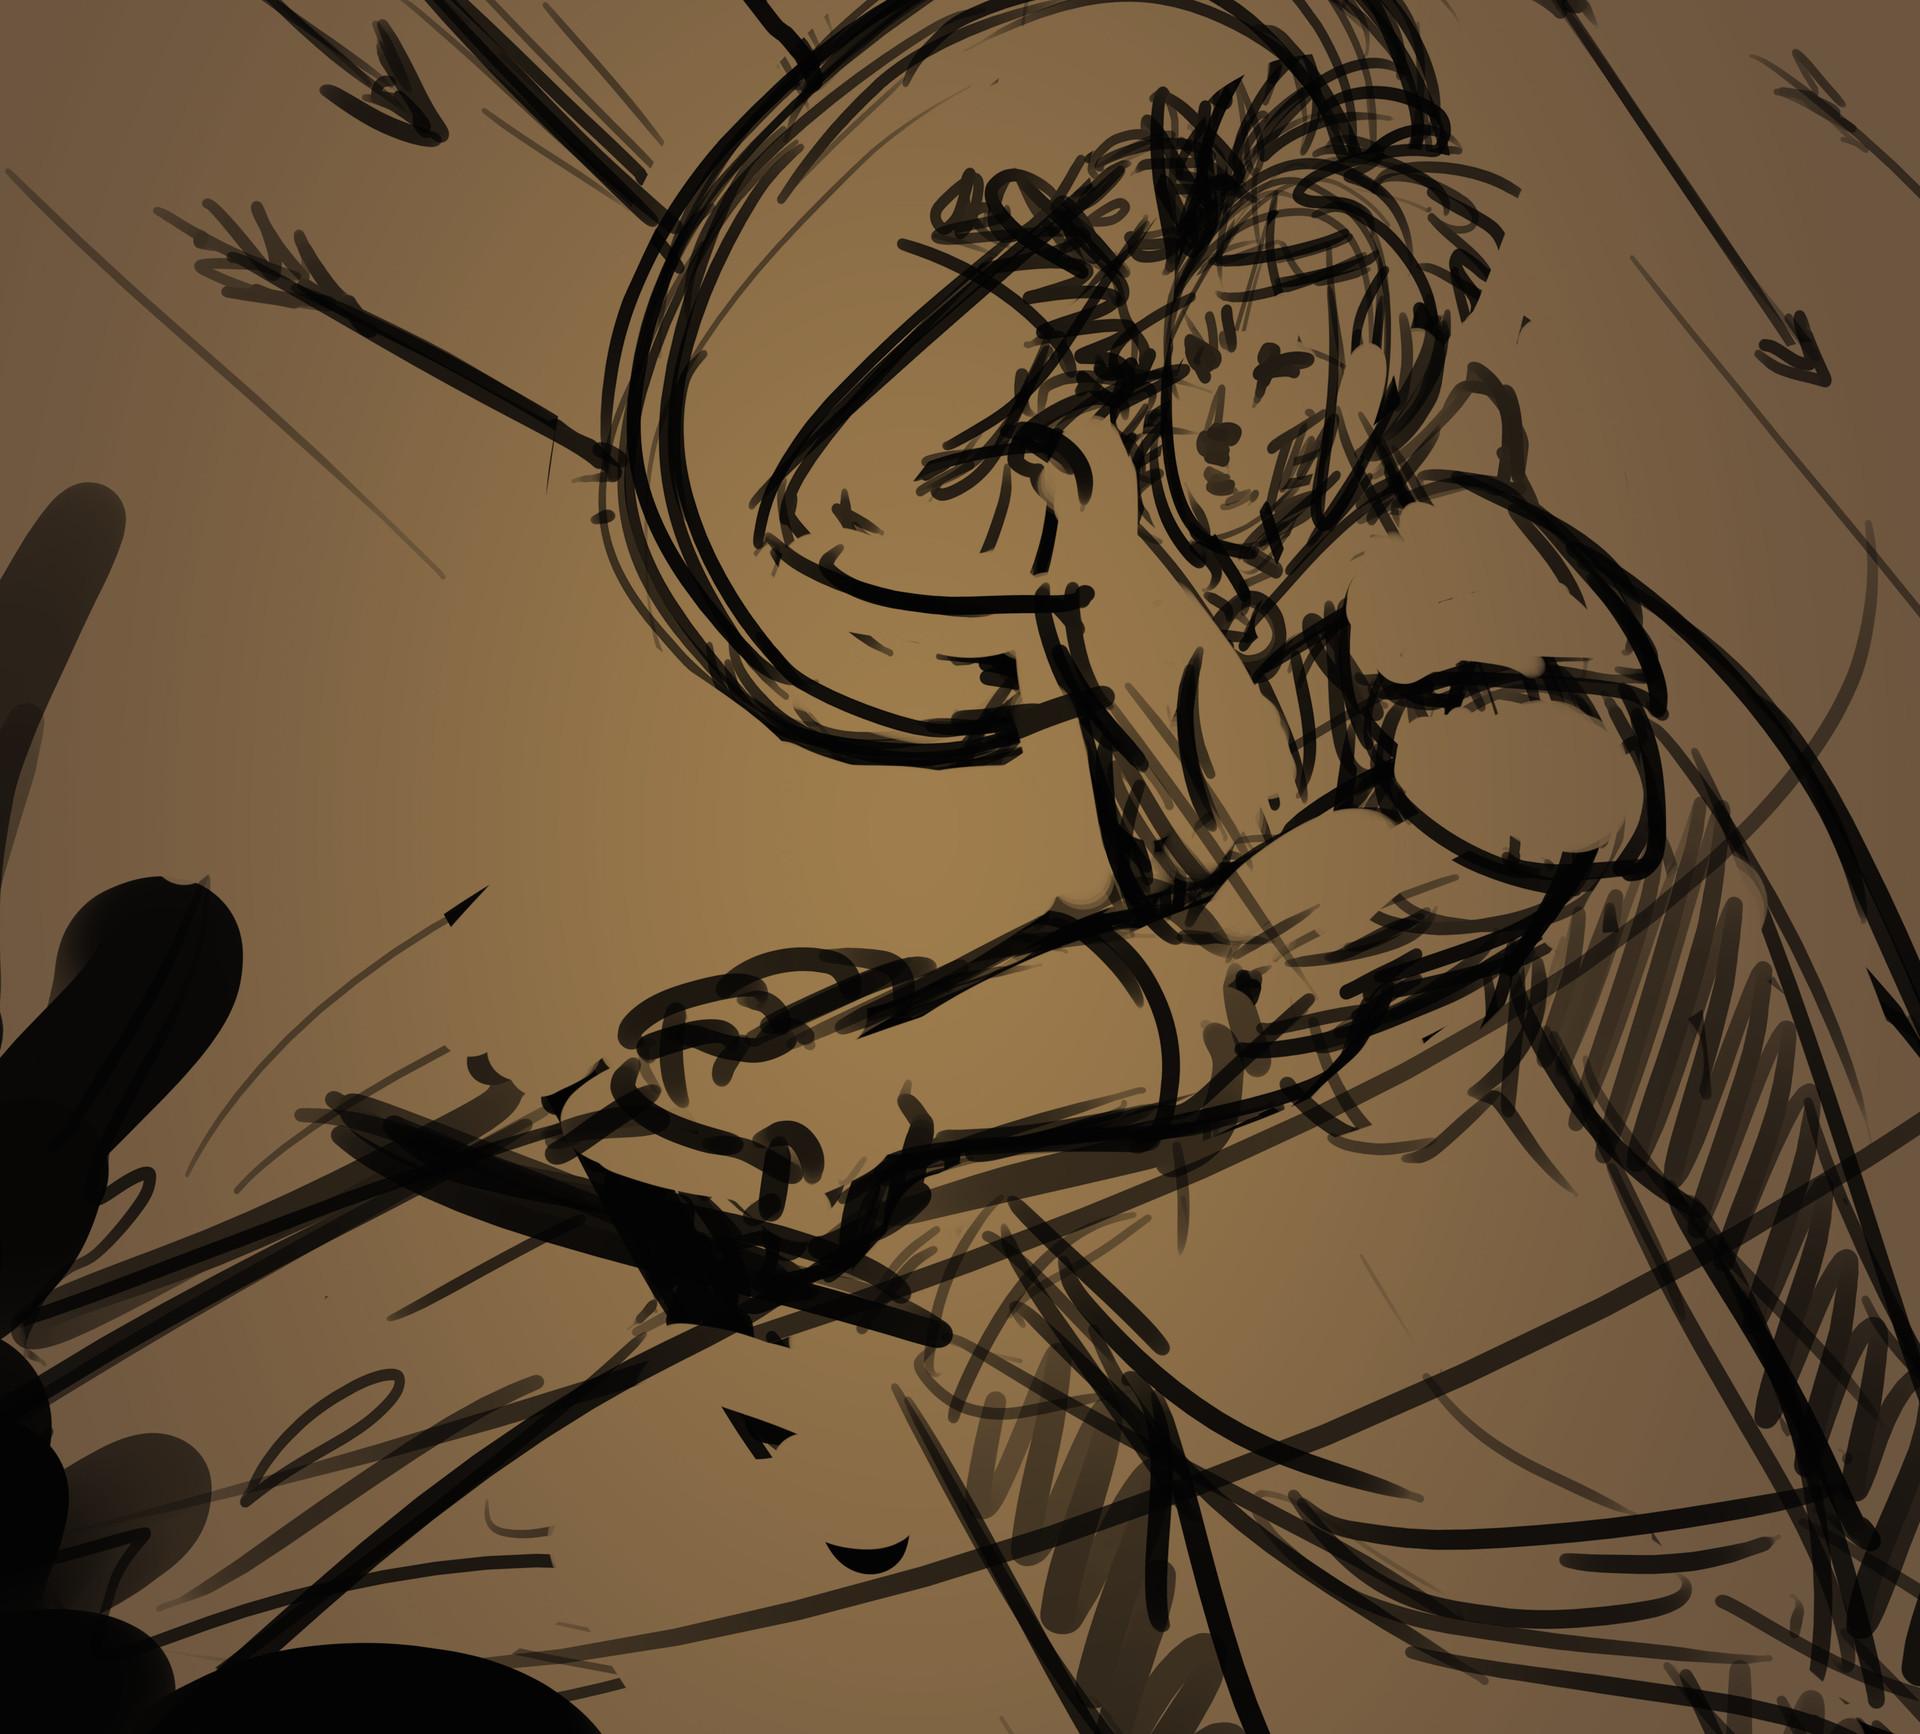 Super rough sketch.